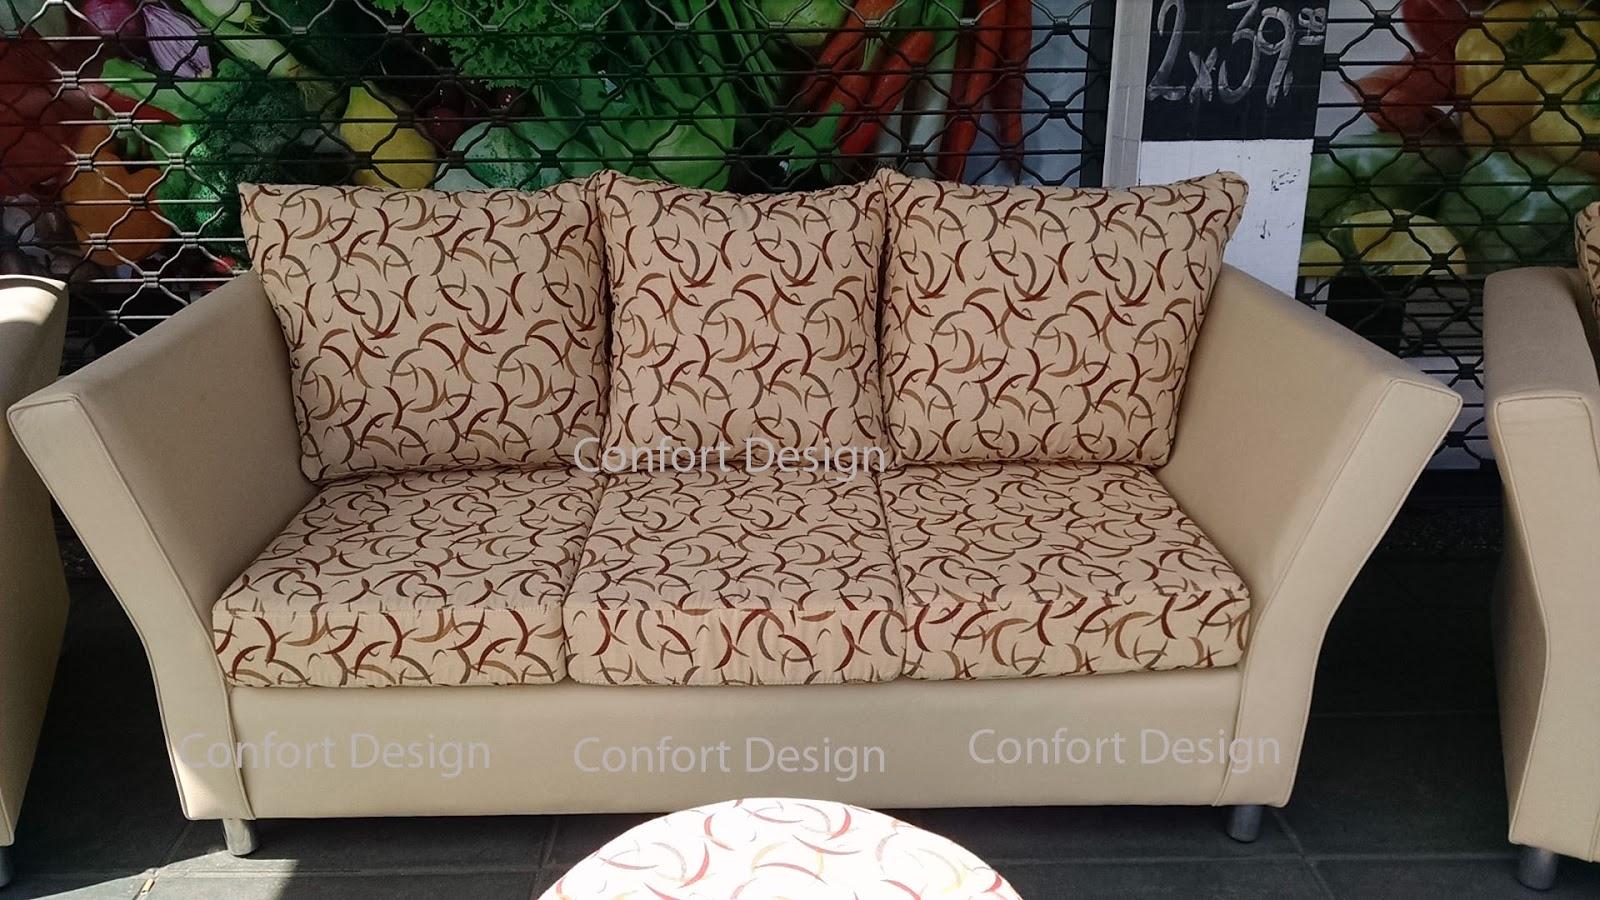 Confort Design Sillones Juego De Living Zule